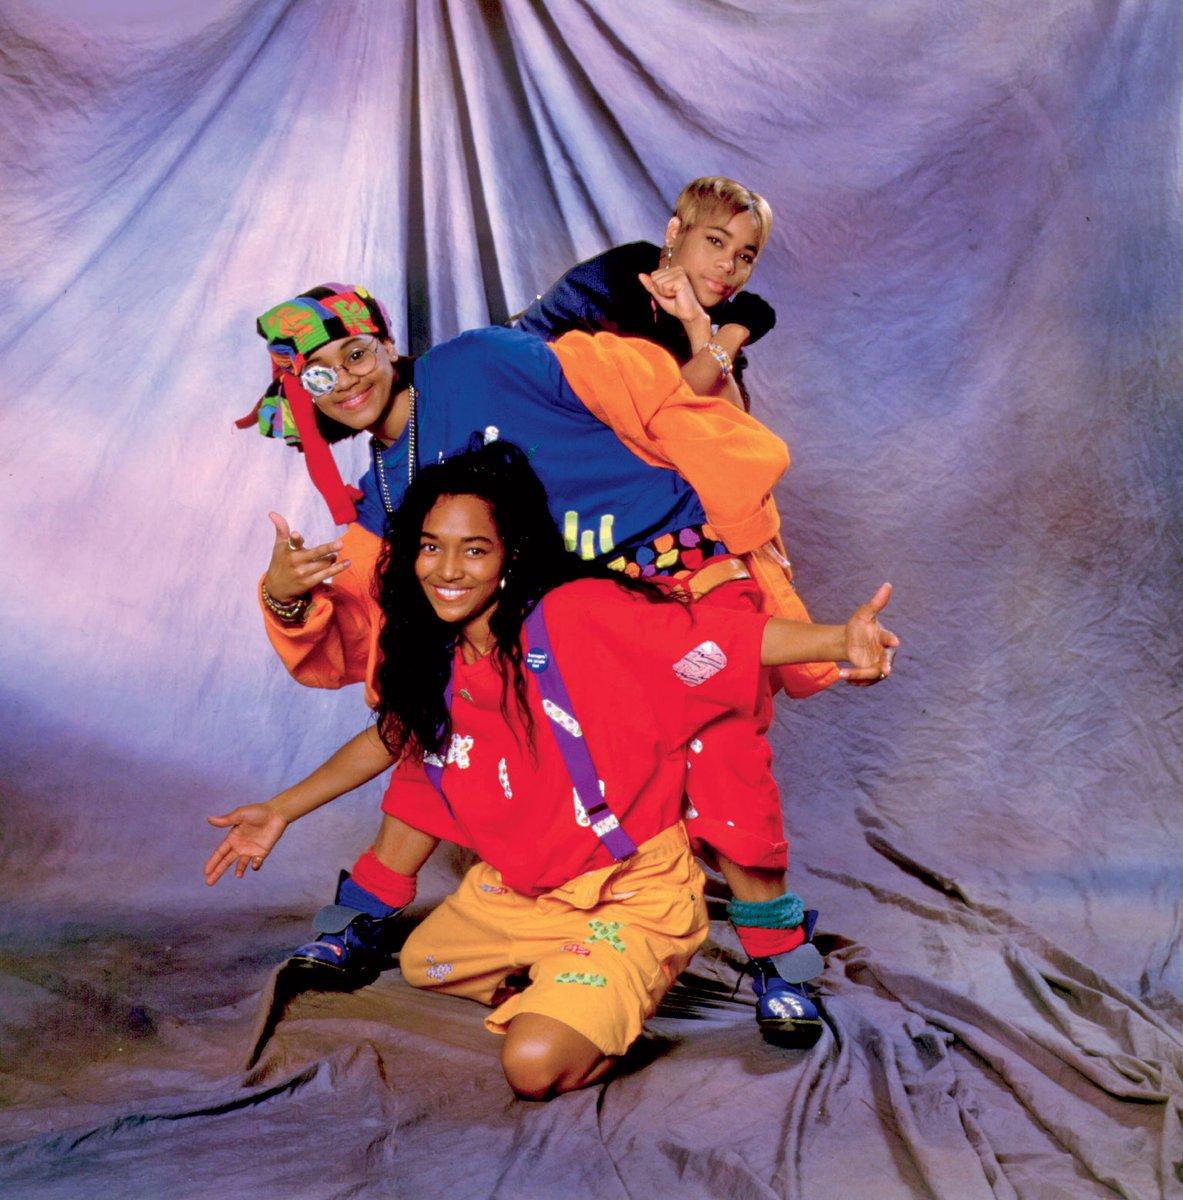 Ooooooohhh... On the TLC Tip™ - Circa 1992  #ThrowbackThursday #TLC #90s #TBoz #LeftEye #Chilli #RIPLeftEye #NoScrubs #Music